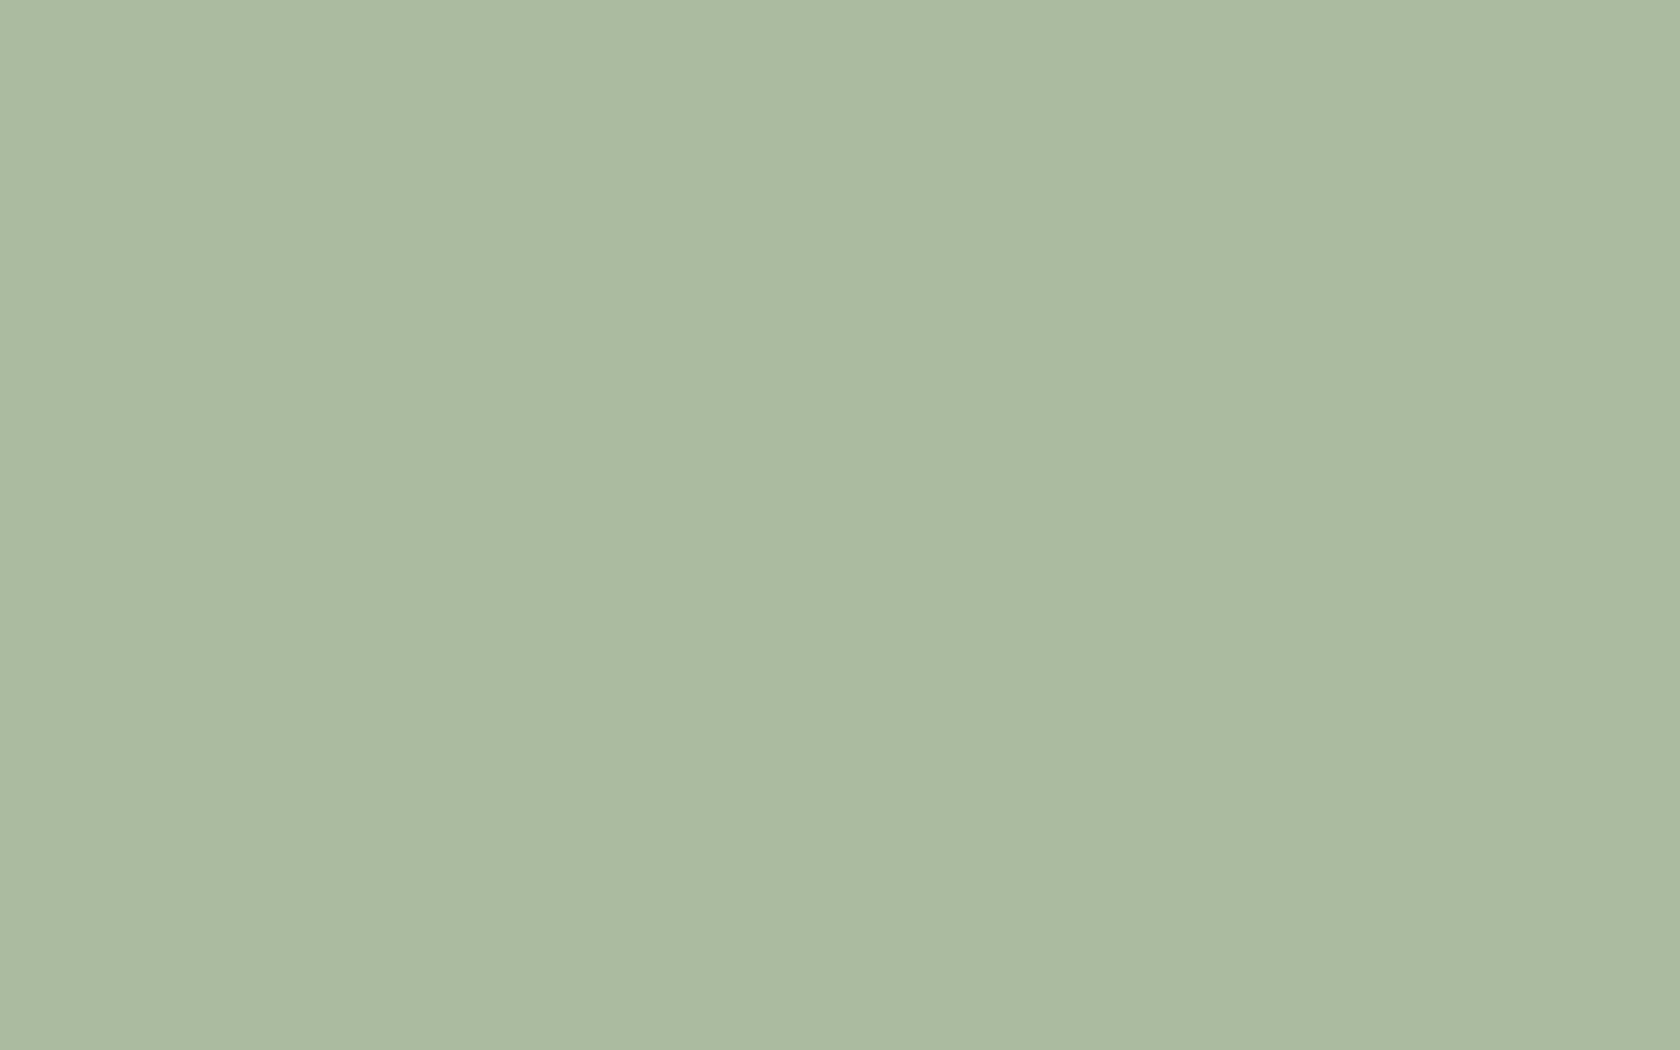 1680x1050 Laurel Green Solid Color Background